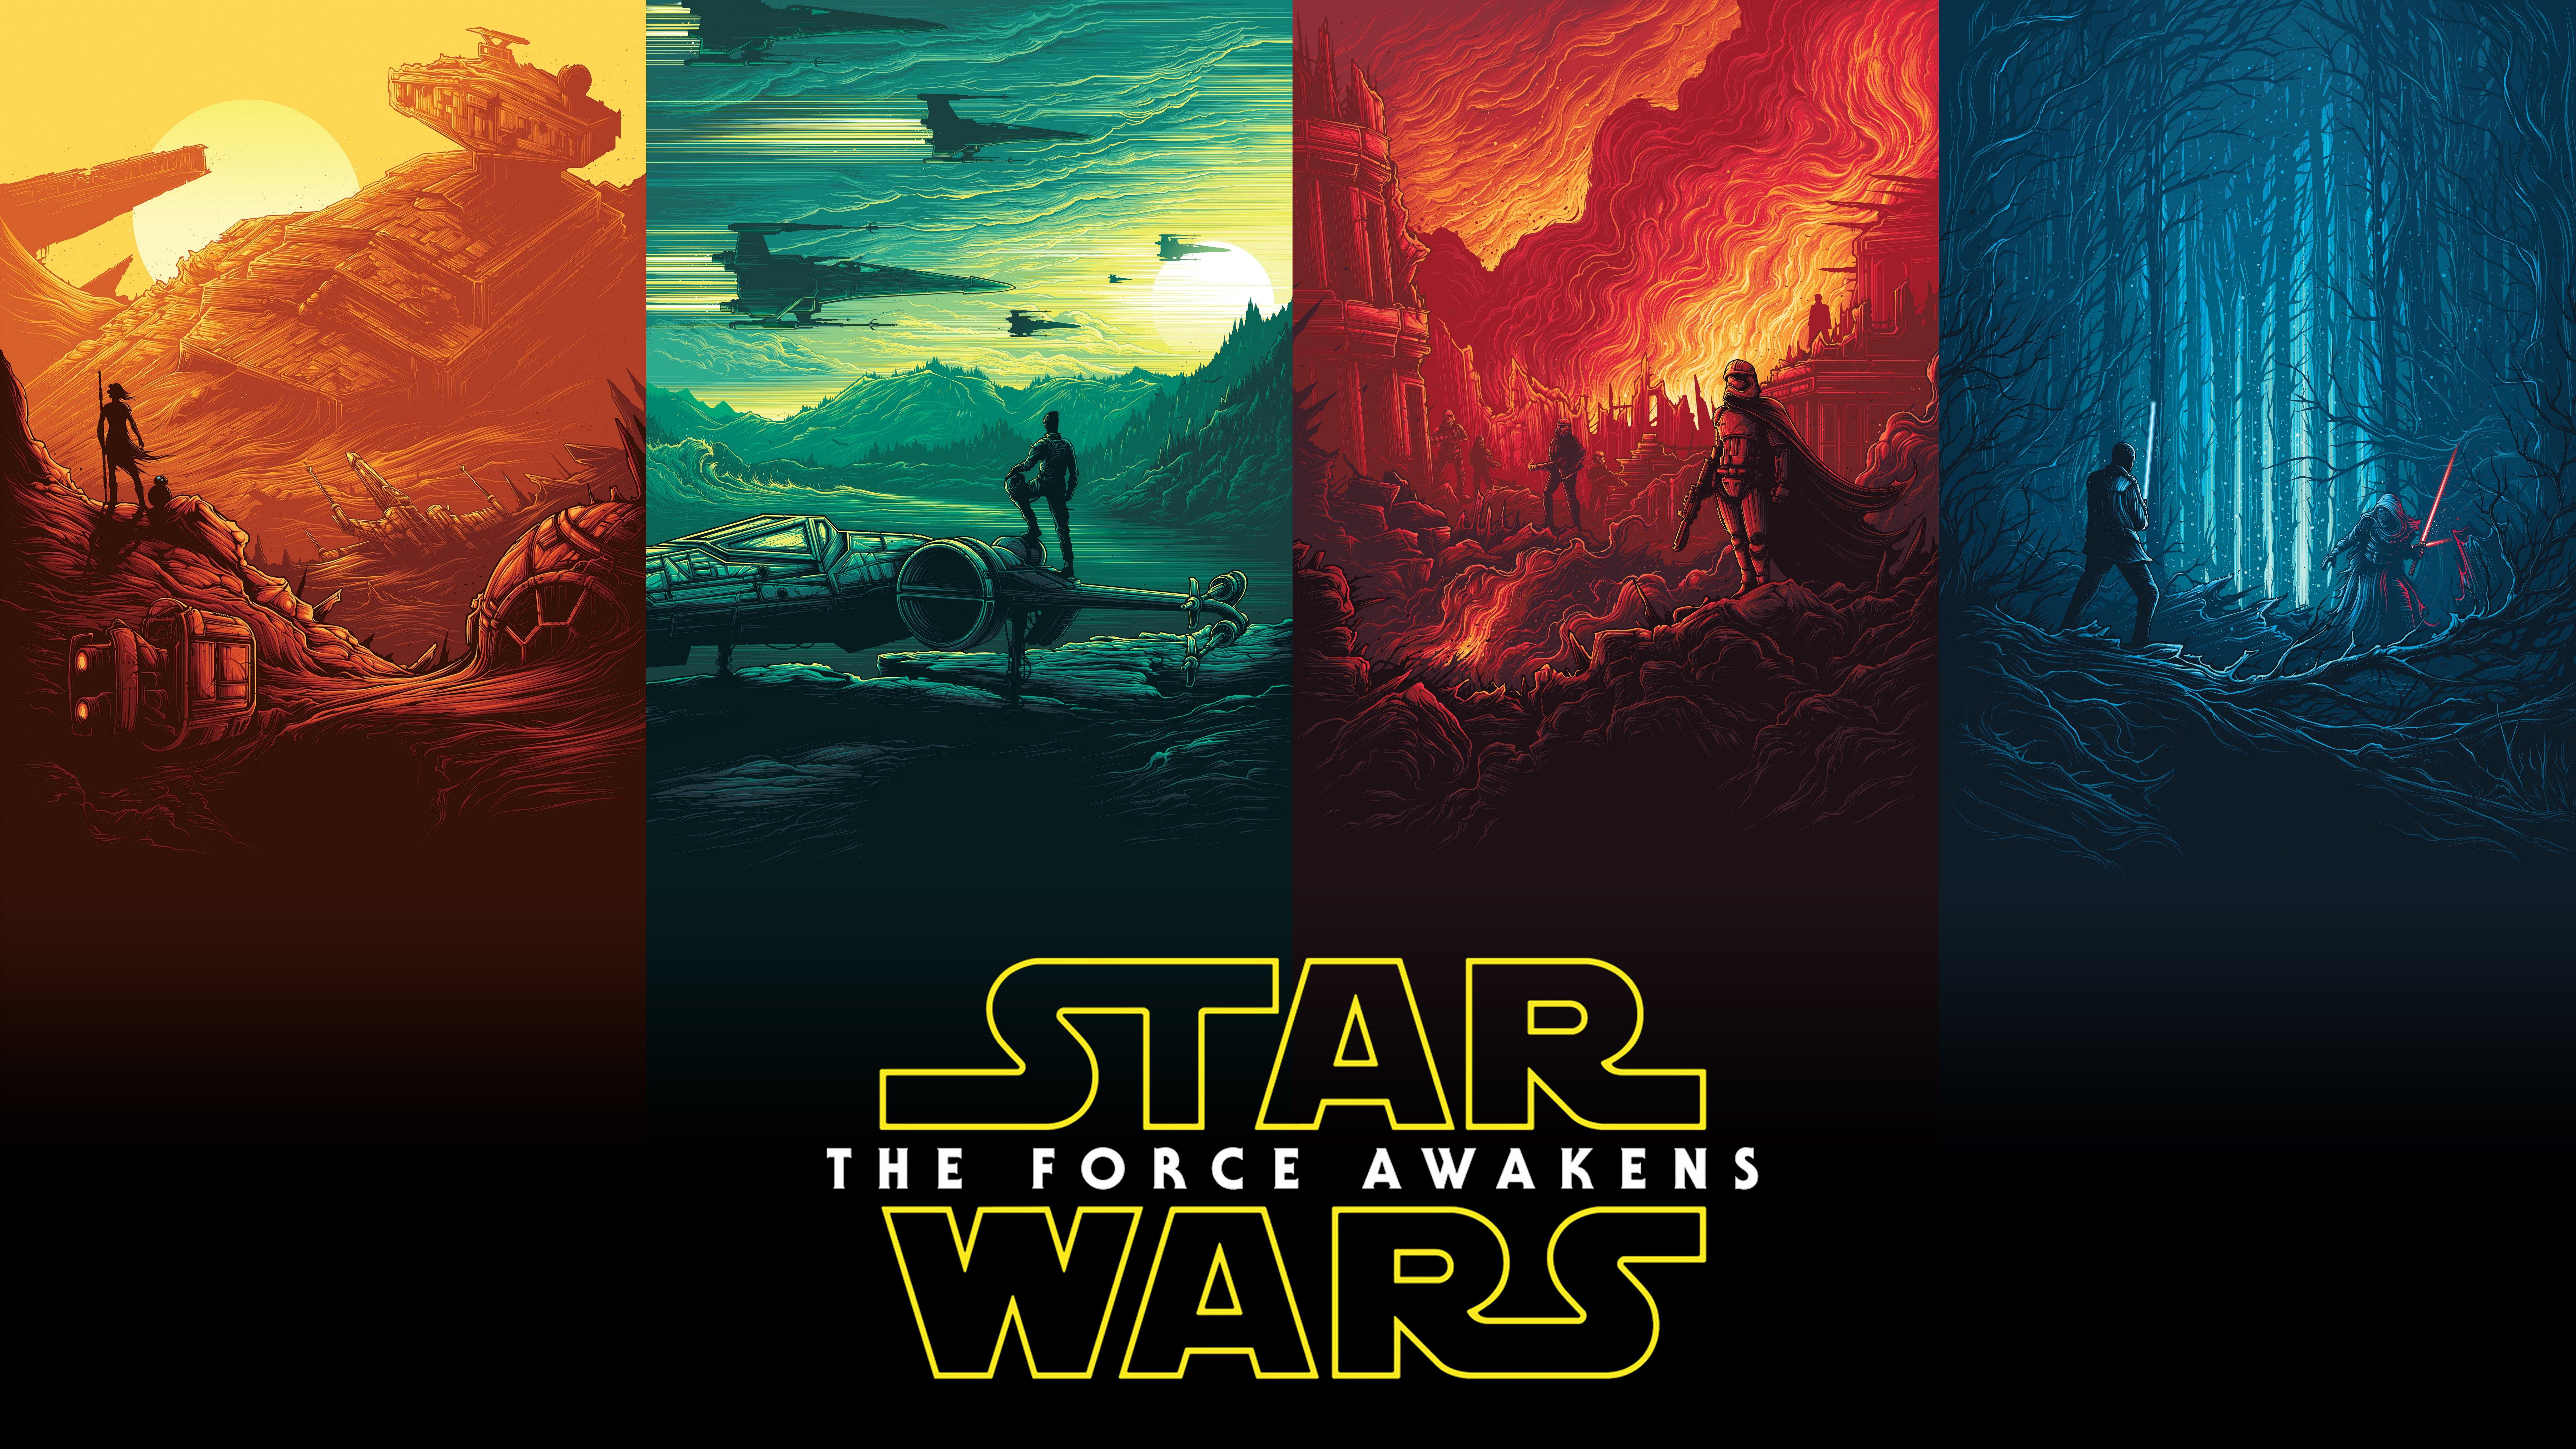 113 1138640 star wars desktop background star wars wallpaper 4k